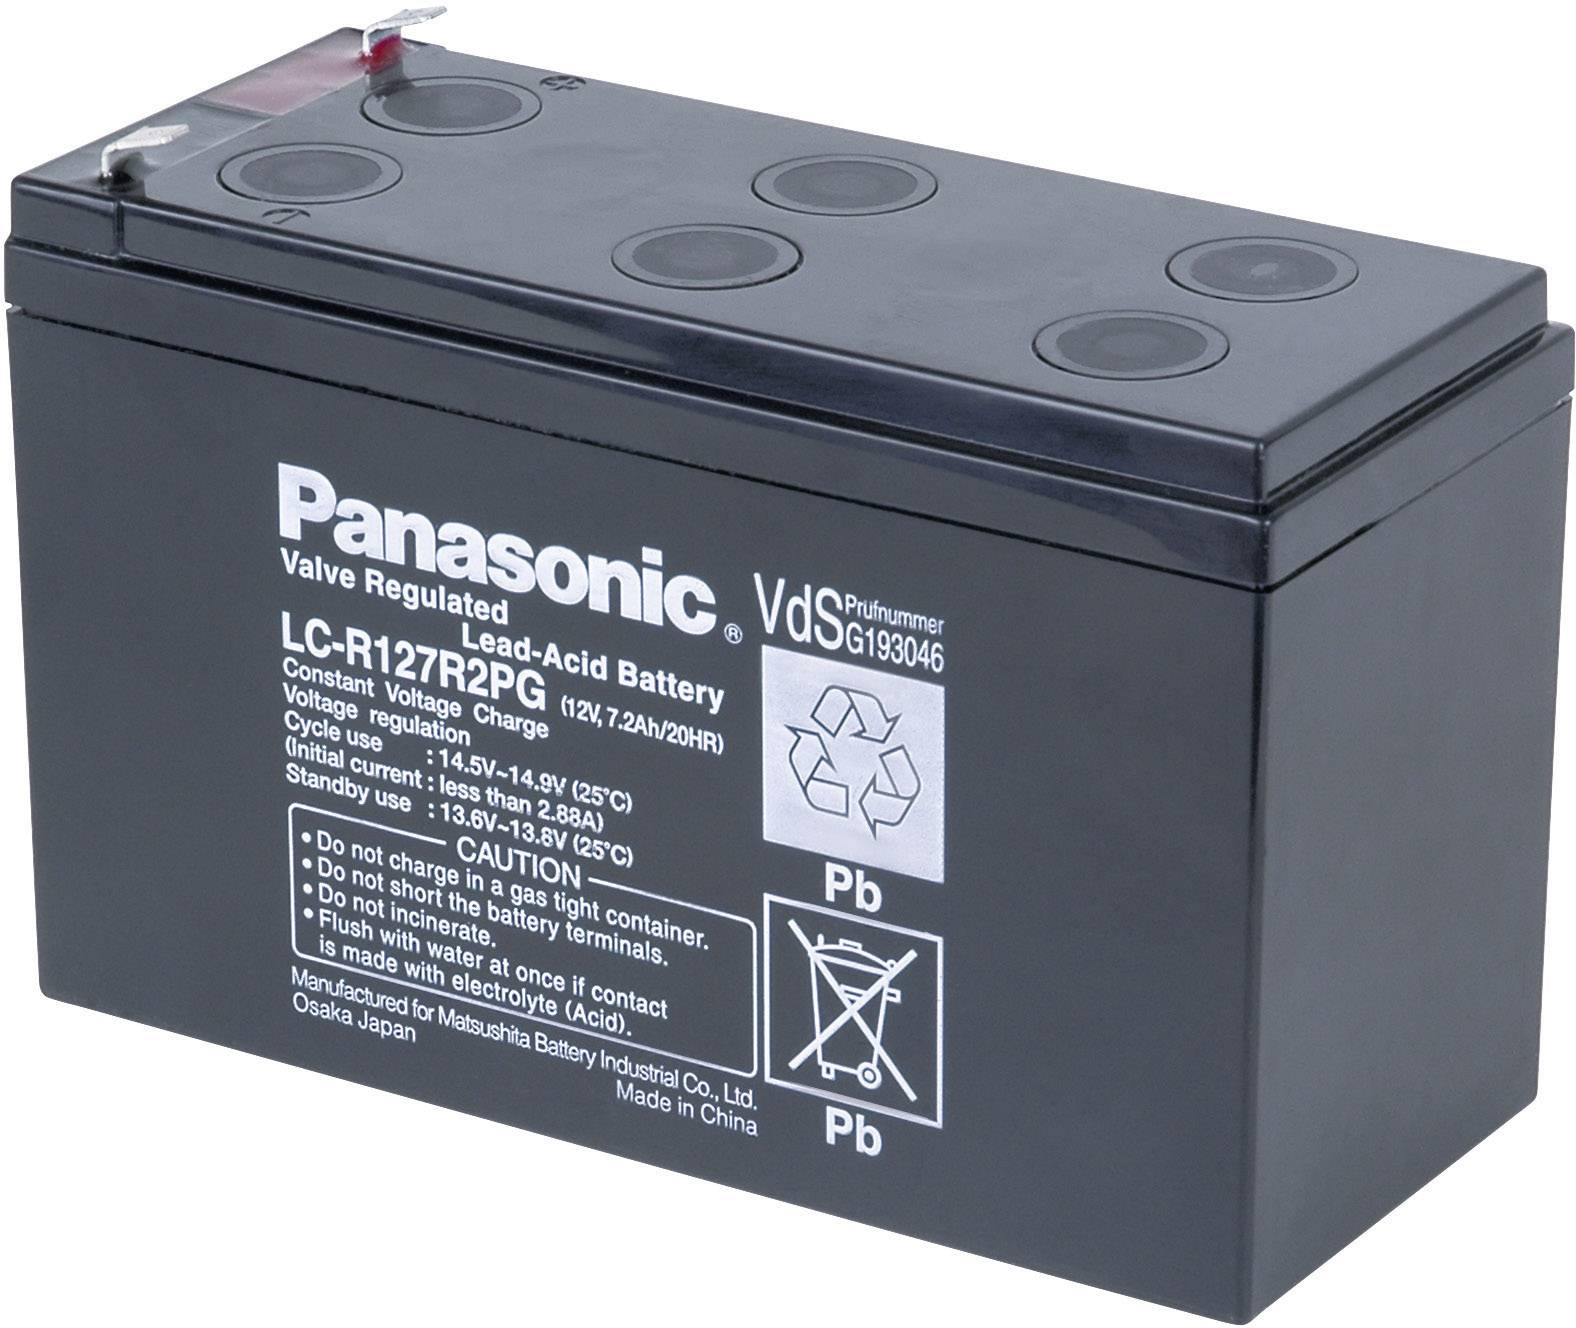 Olovený akumulátor Panasonic 12 V 7,2 Ah LC-R127R2PG, 7.2 Ah, 12 V